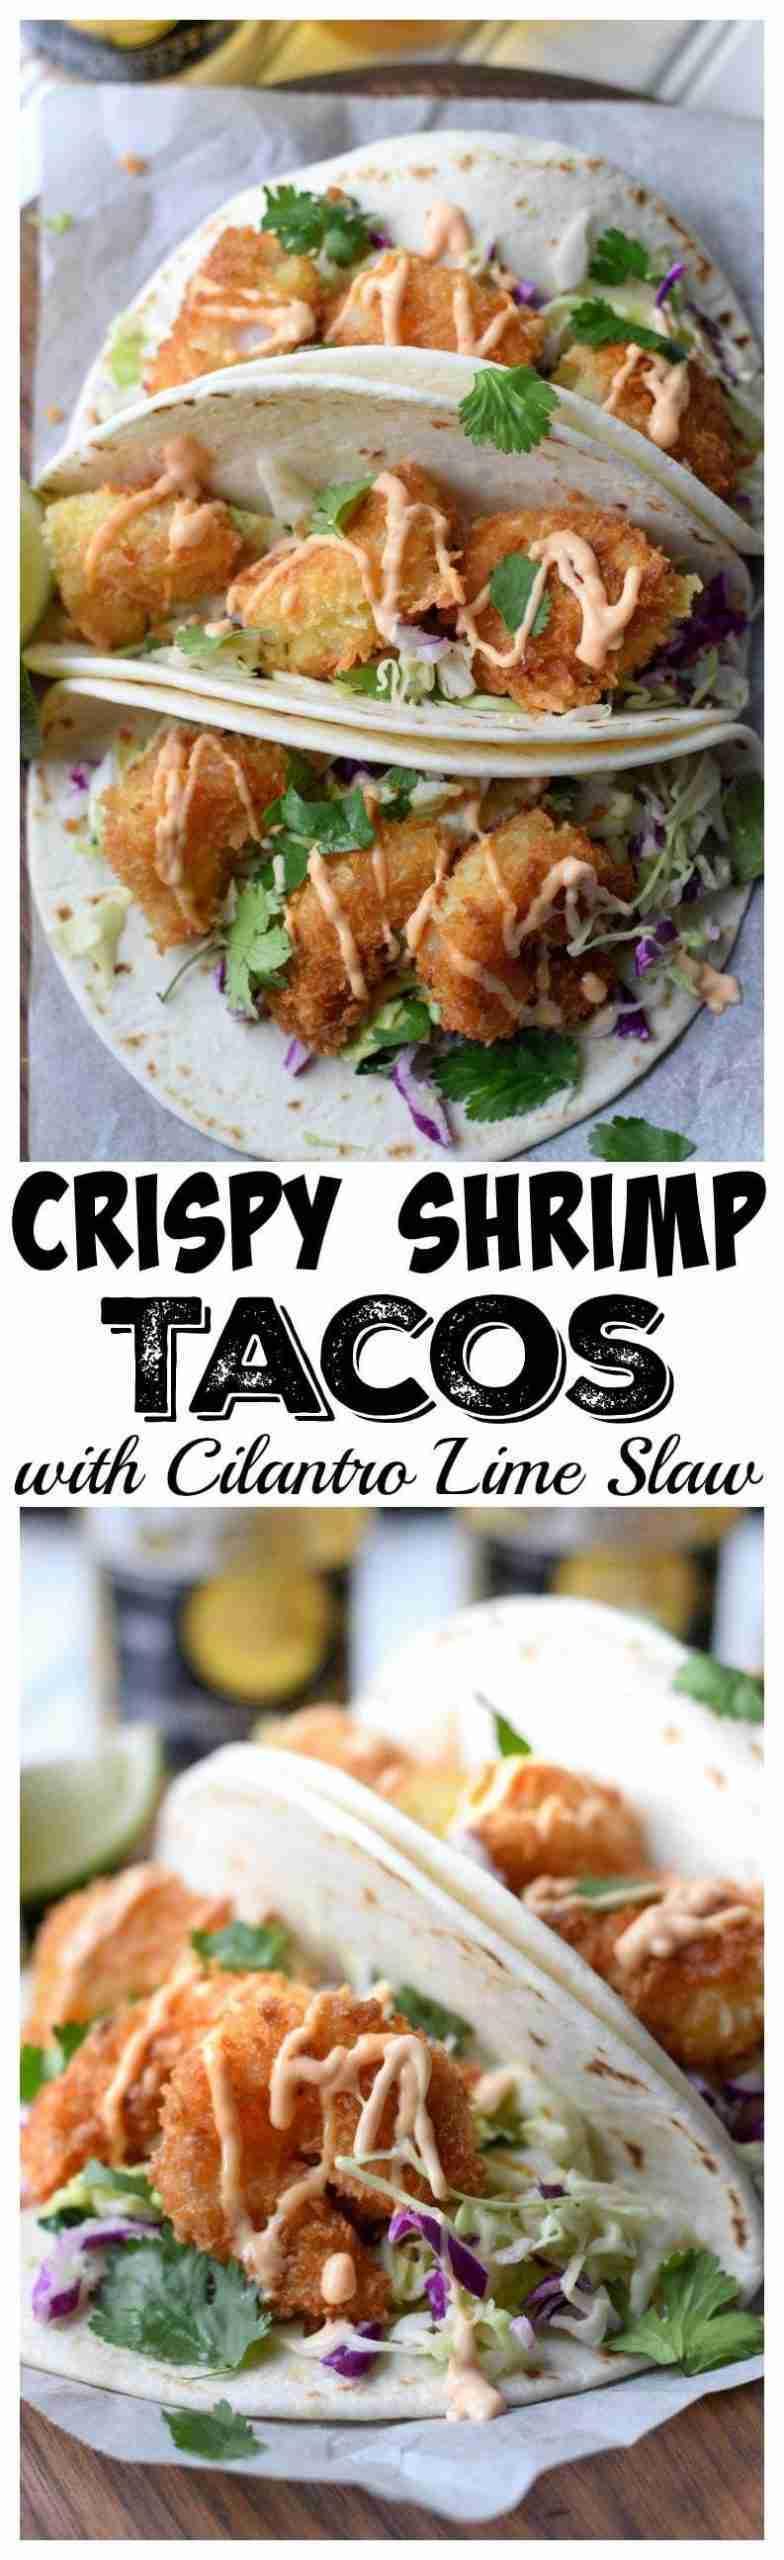 Crispy Shrimp Tacos with Cilantro Slaw-Butter Your Biscuit